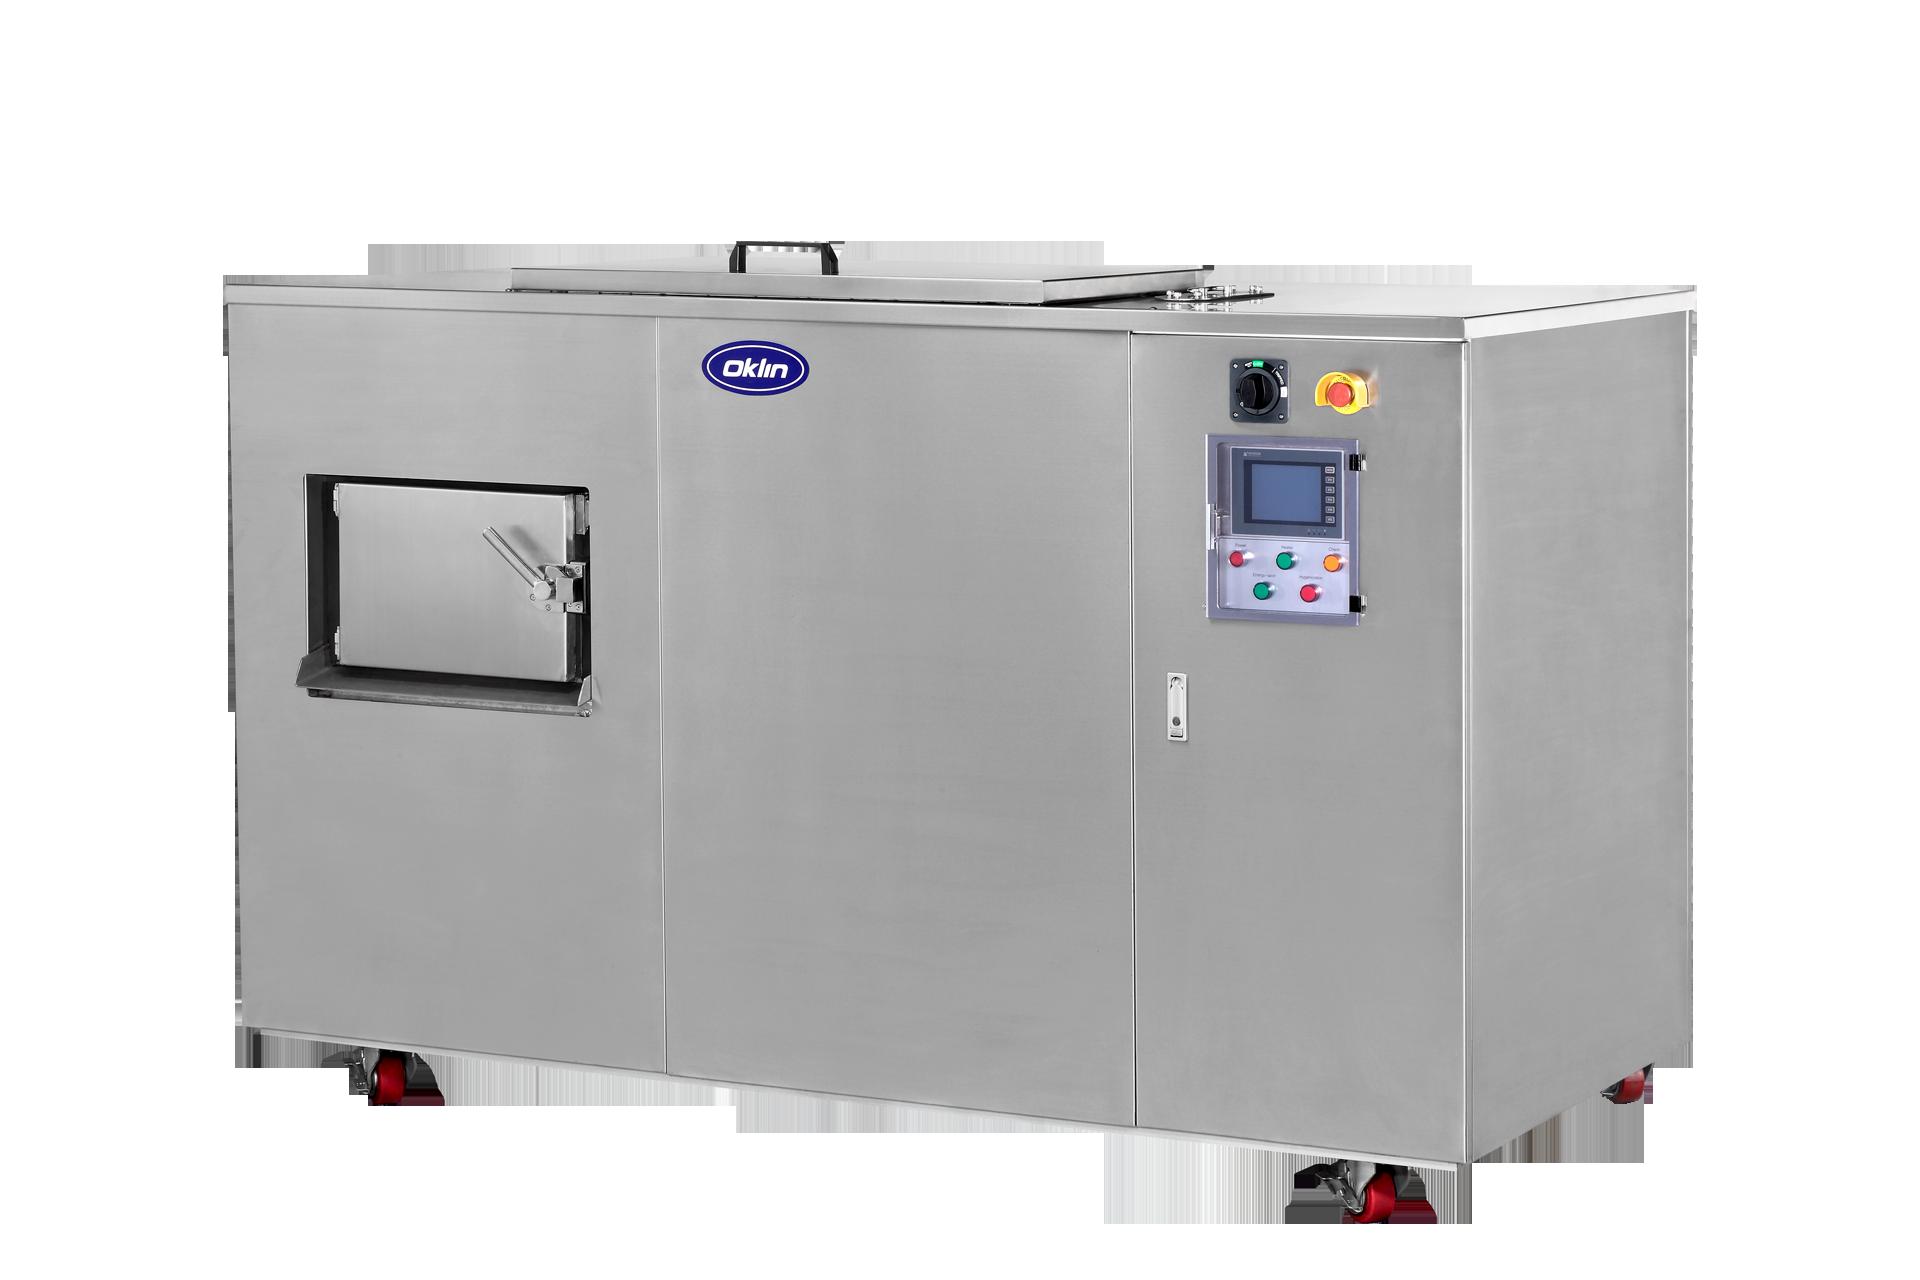 Industrial Compost Machine   Oklin GG100s   Medium Facility Composter